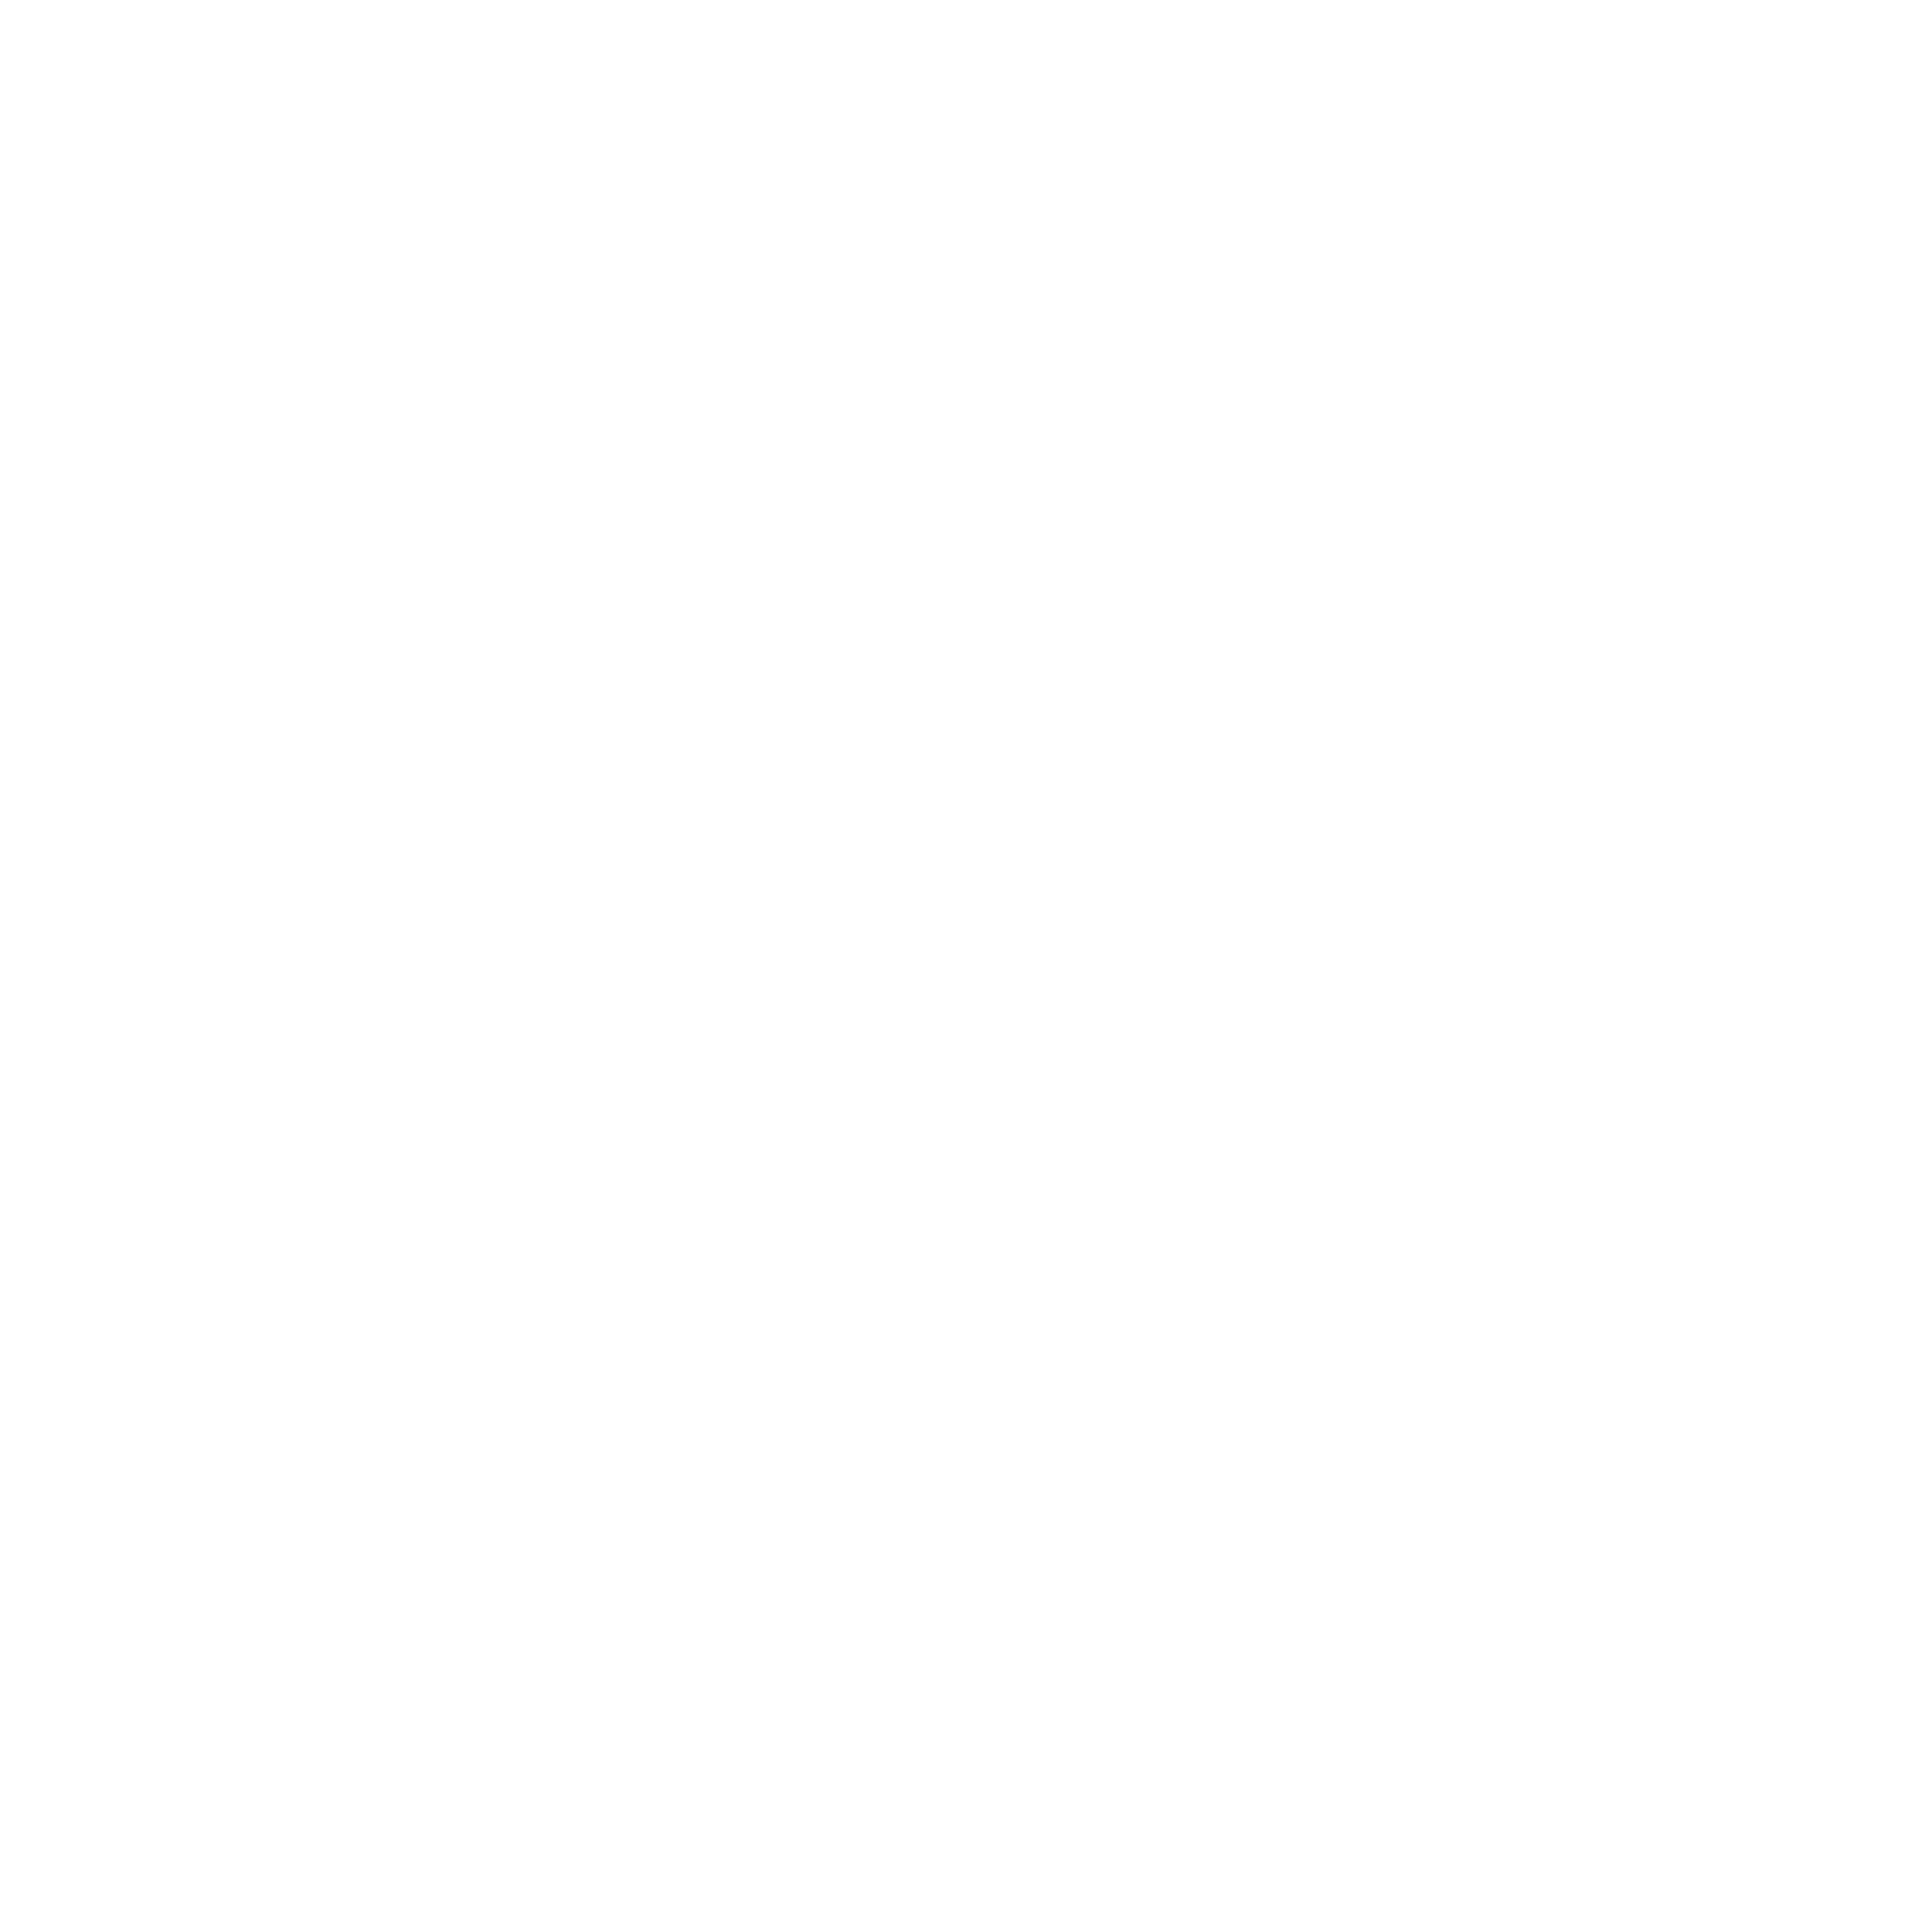 Krla Stratégie & Communication digitale- logo